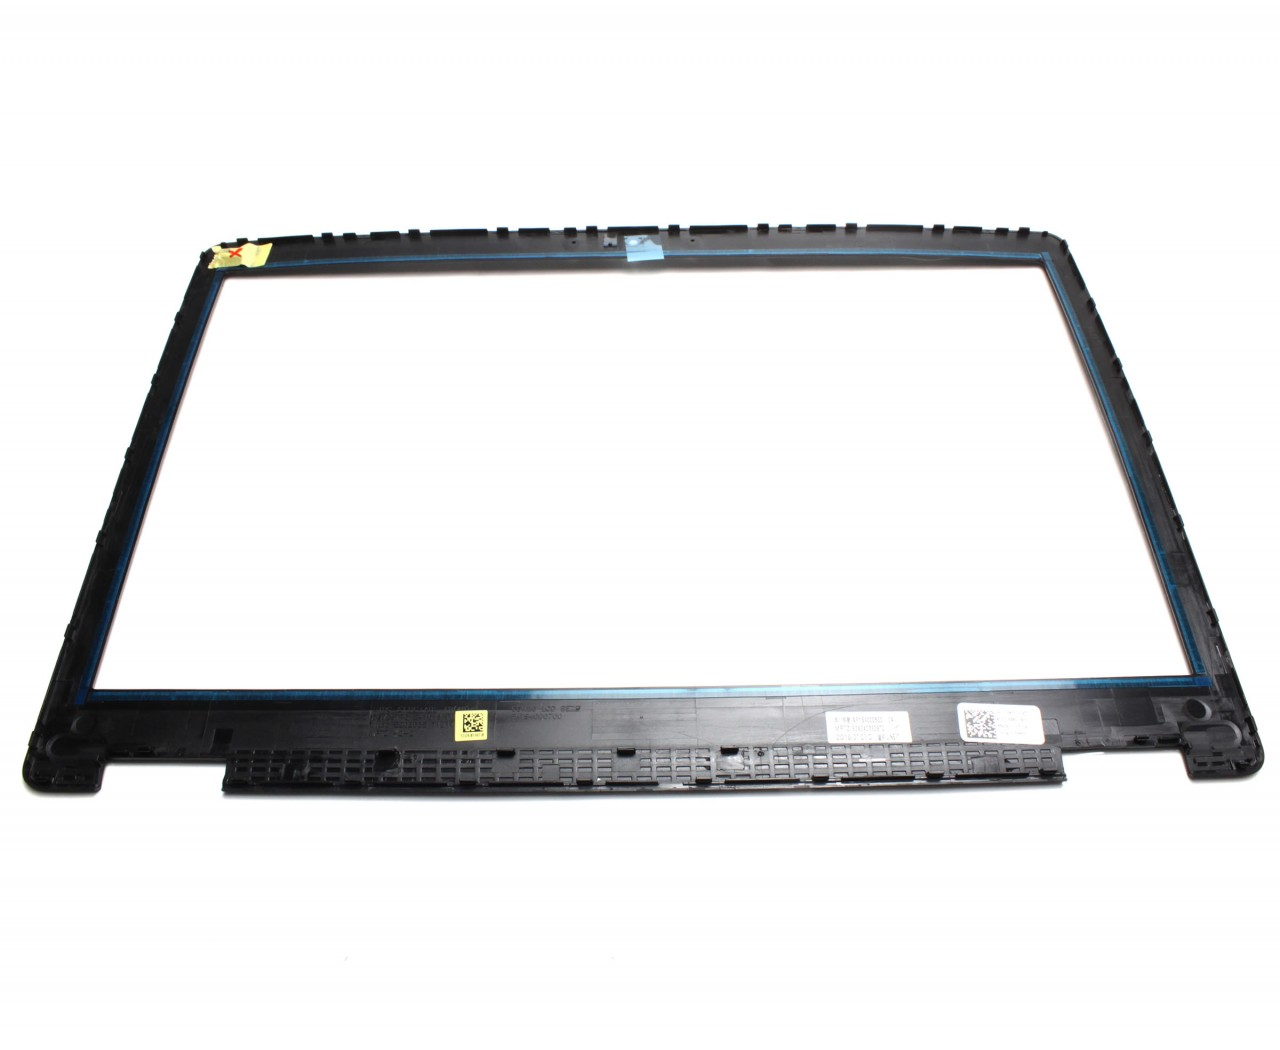 Rama Display Dell GPM65 Bezel Front Cover Neagra imagine powerlaptop.ro 2021